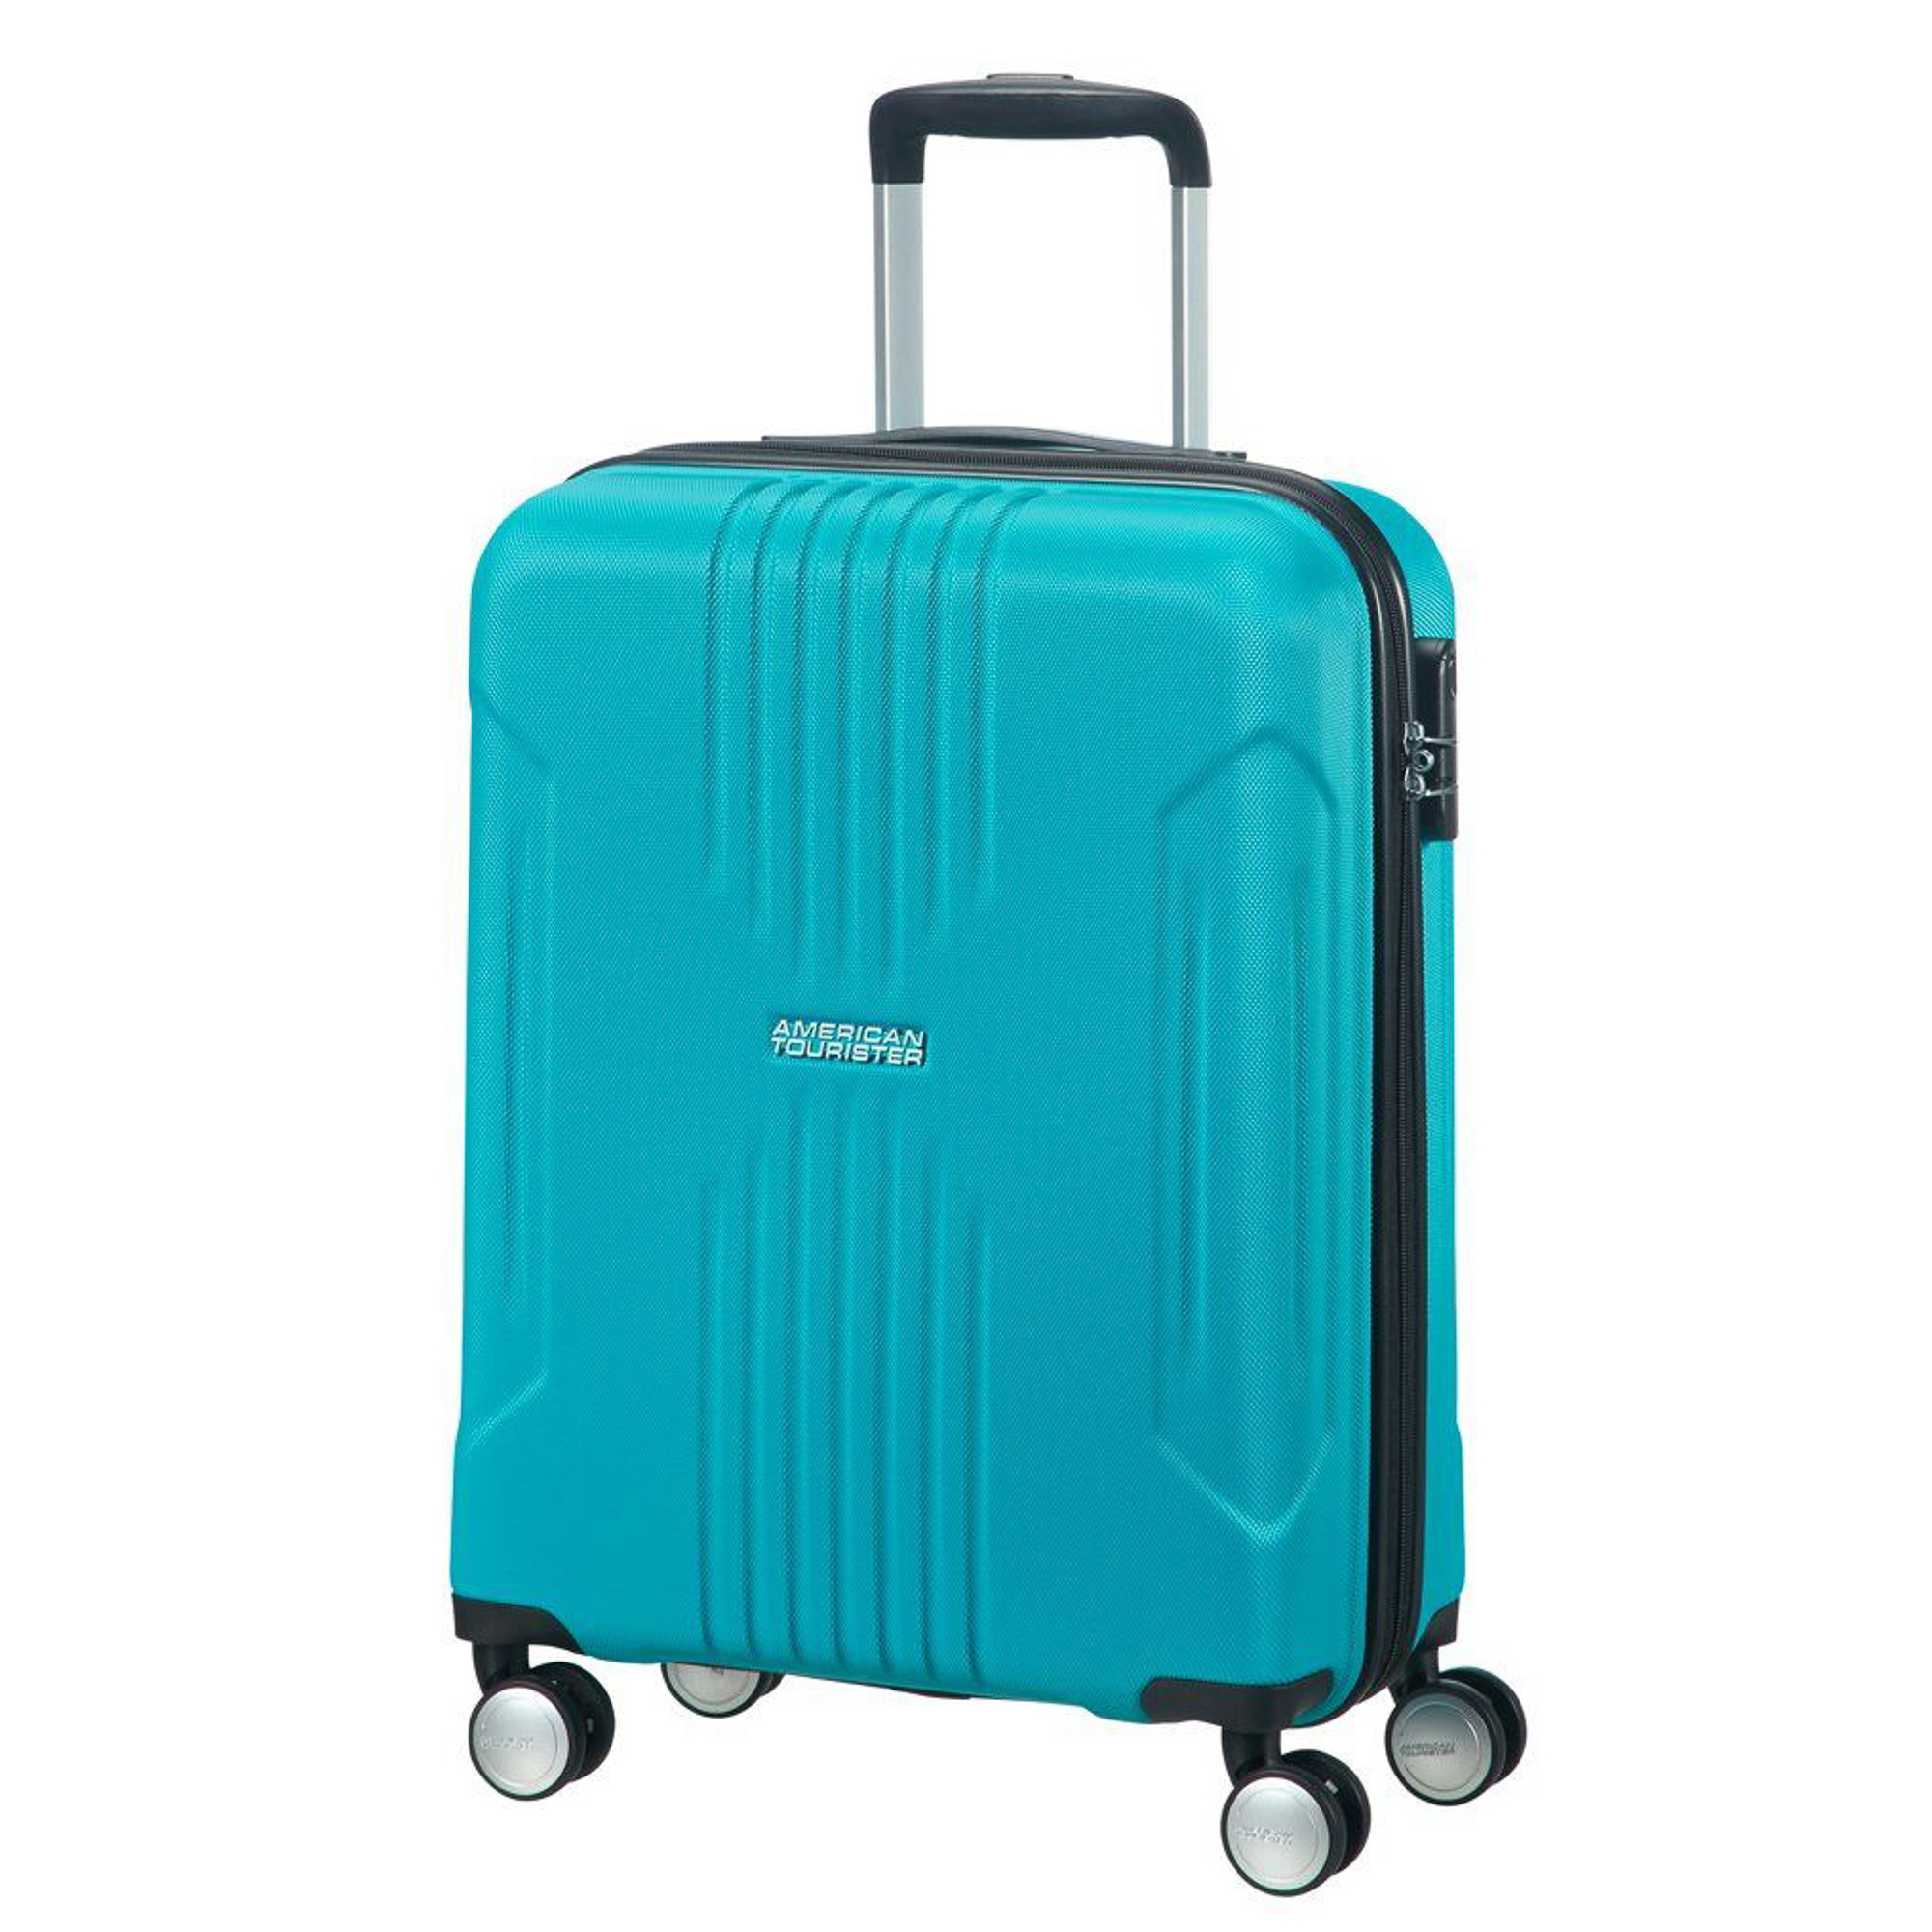 Чемодан American Tourister Spinner синий M american tourister american tourister litewing 38g 09003